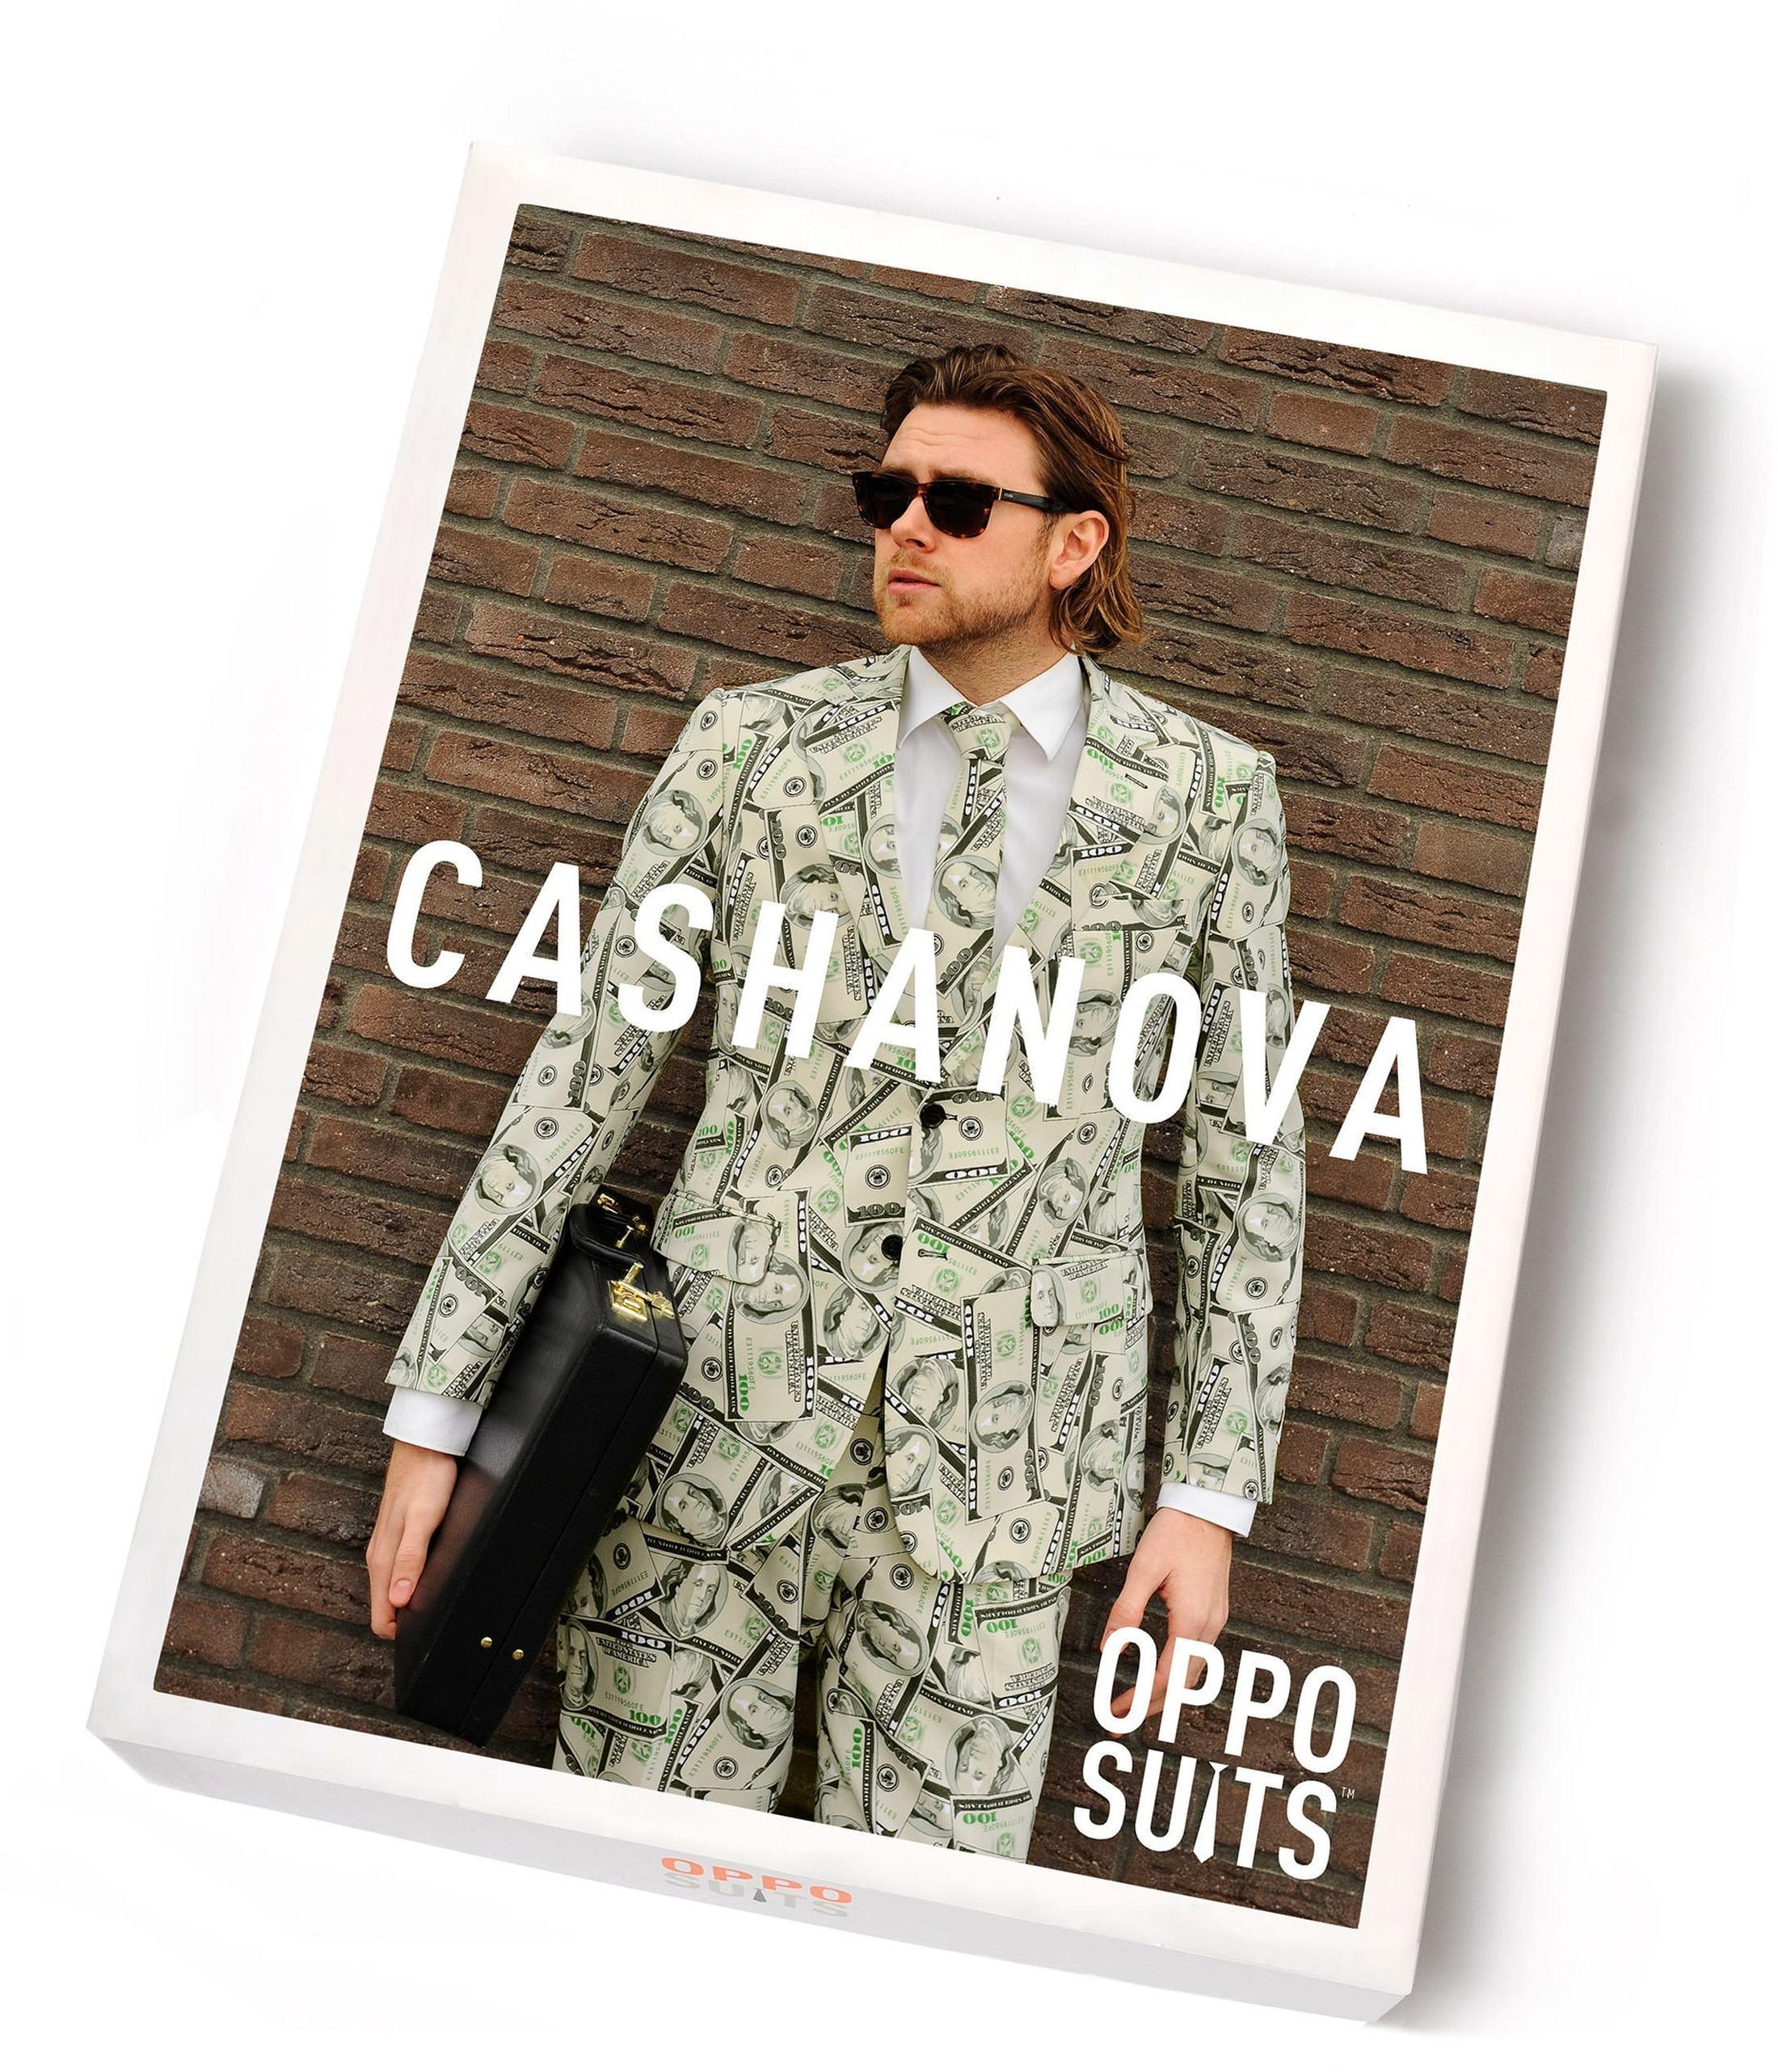 OppoSuits Cashanova Kostüm